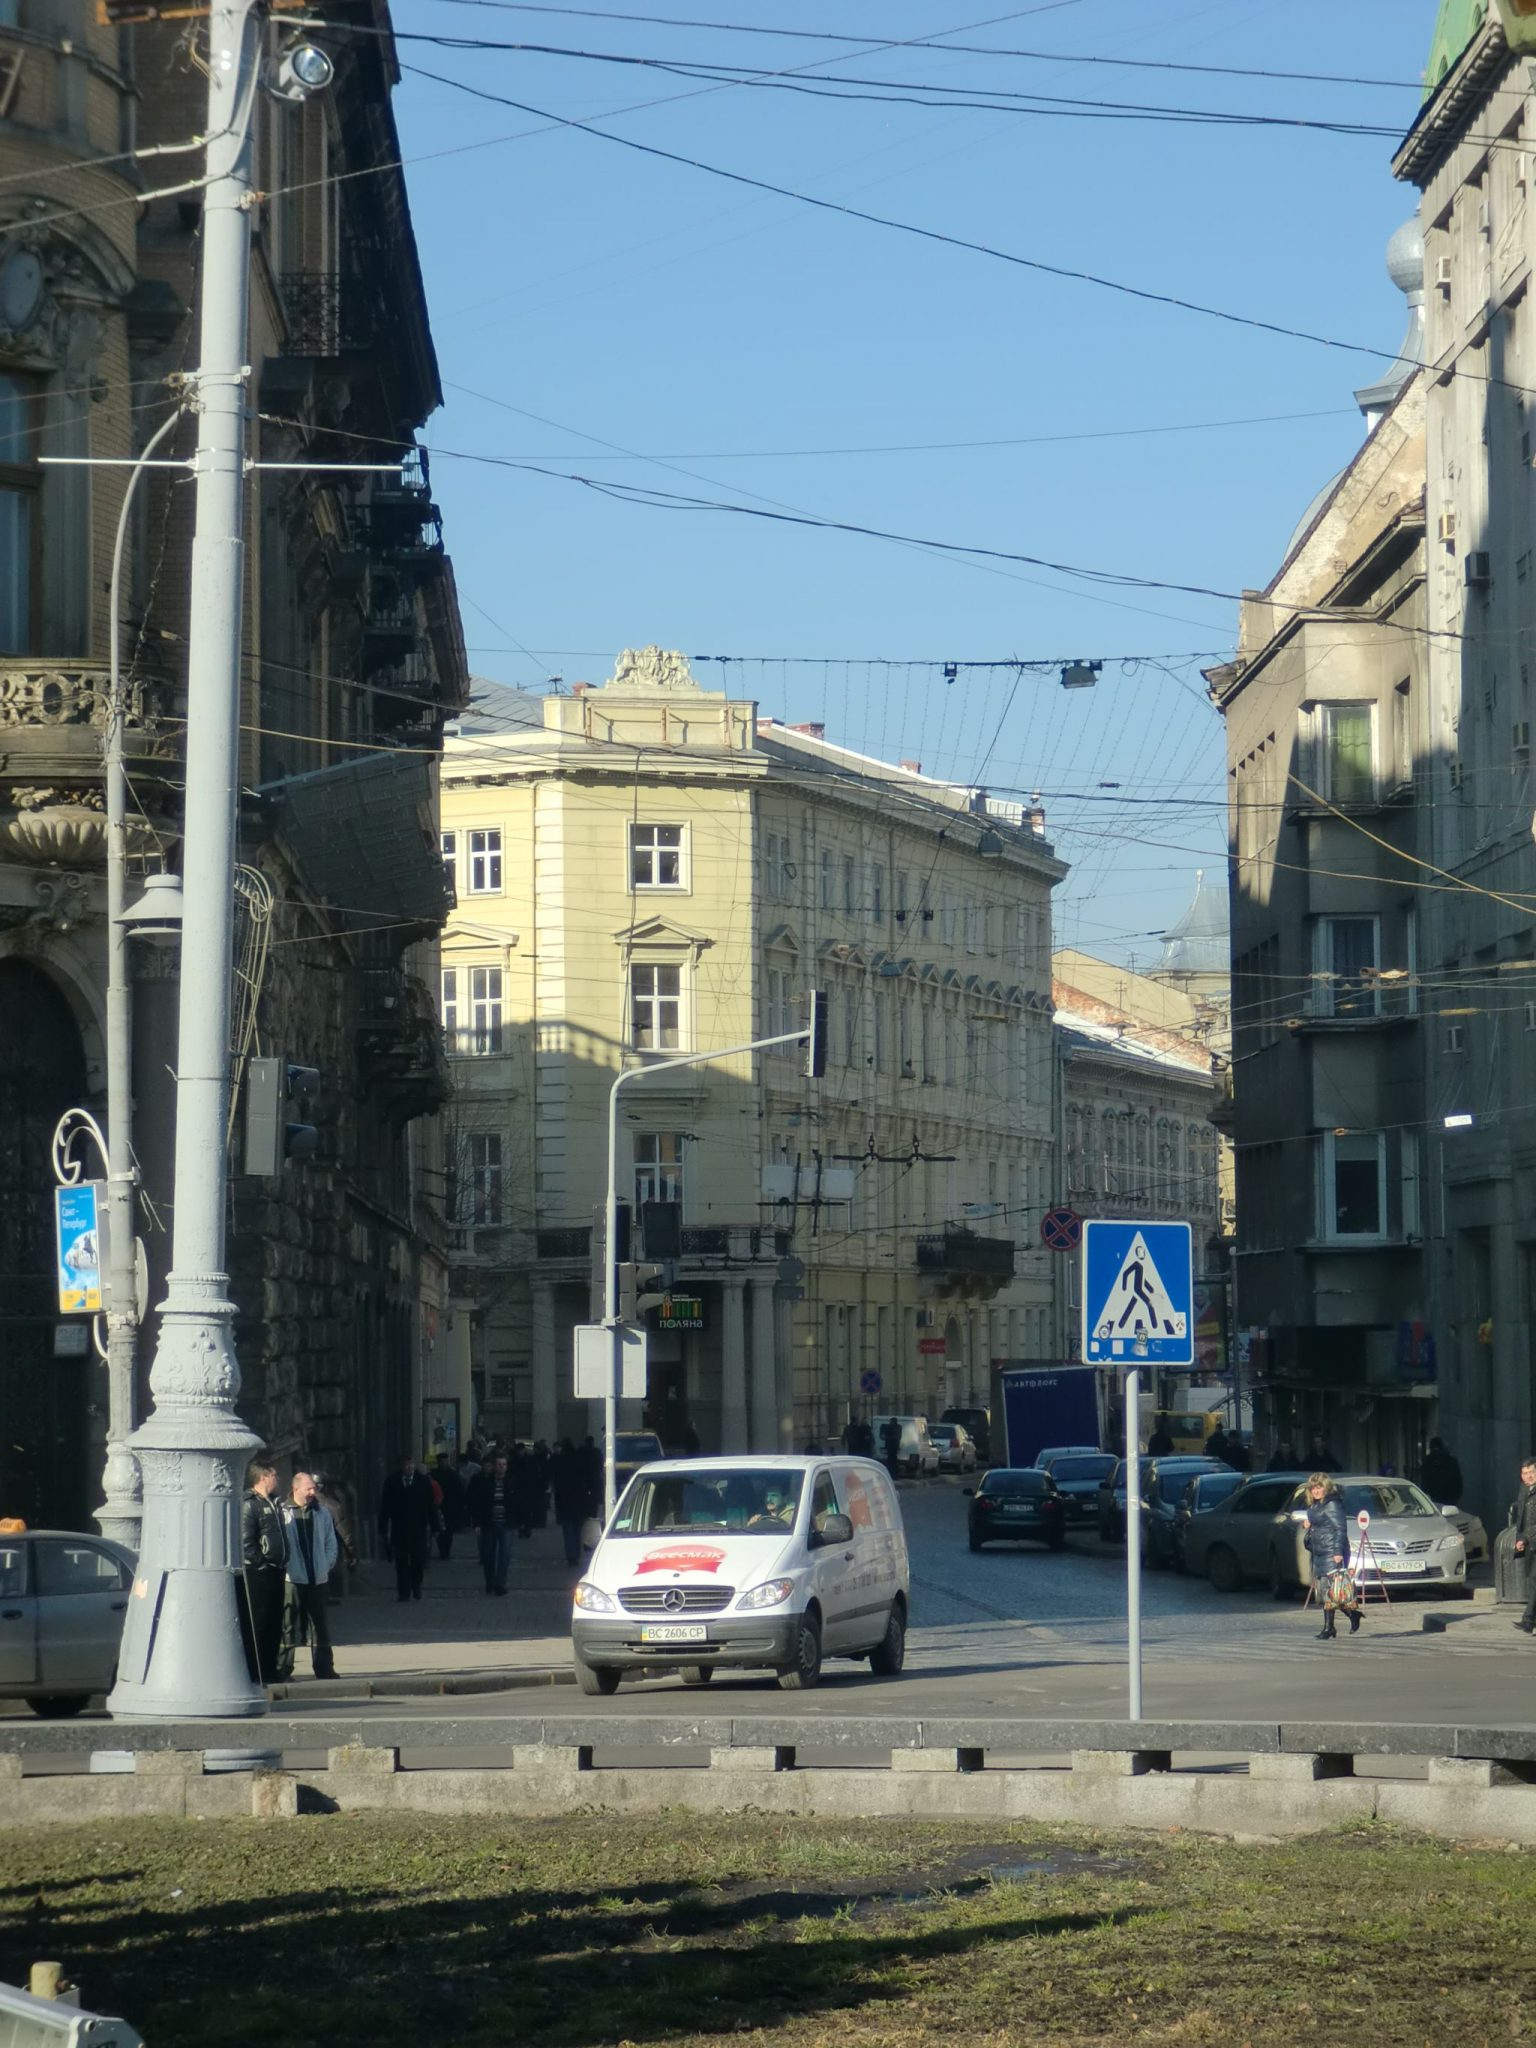 Lviv buildings 6 - Lviv, the Ukrainian pearl